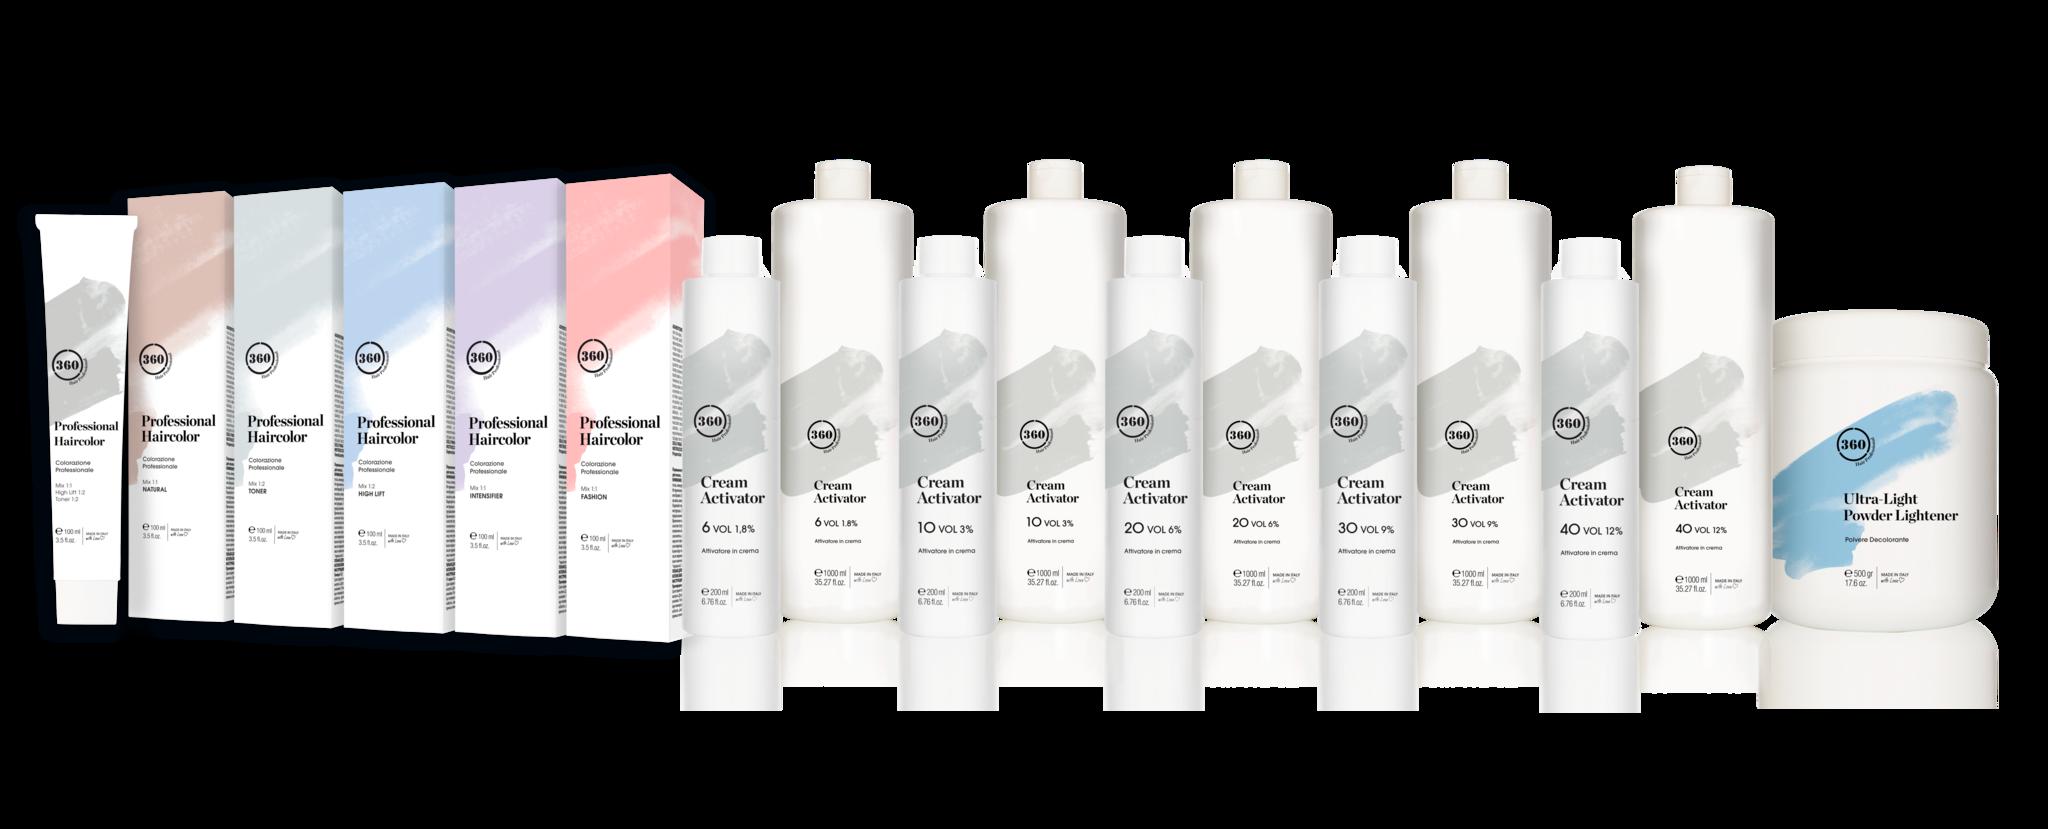 Kaaral 360 cream activator 20  vol - 6% peroxide 200ml